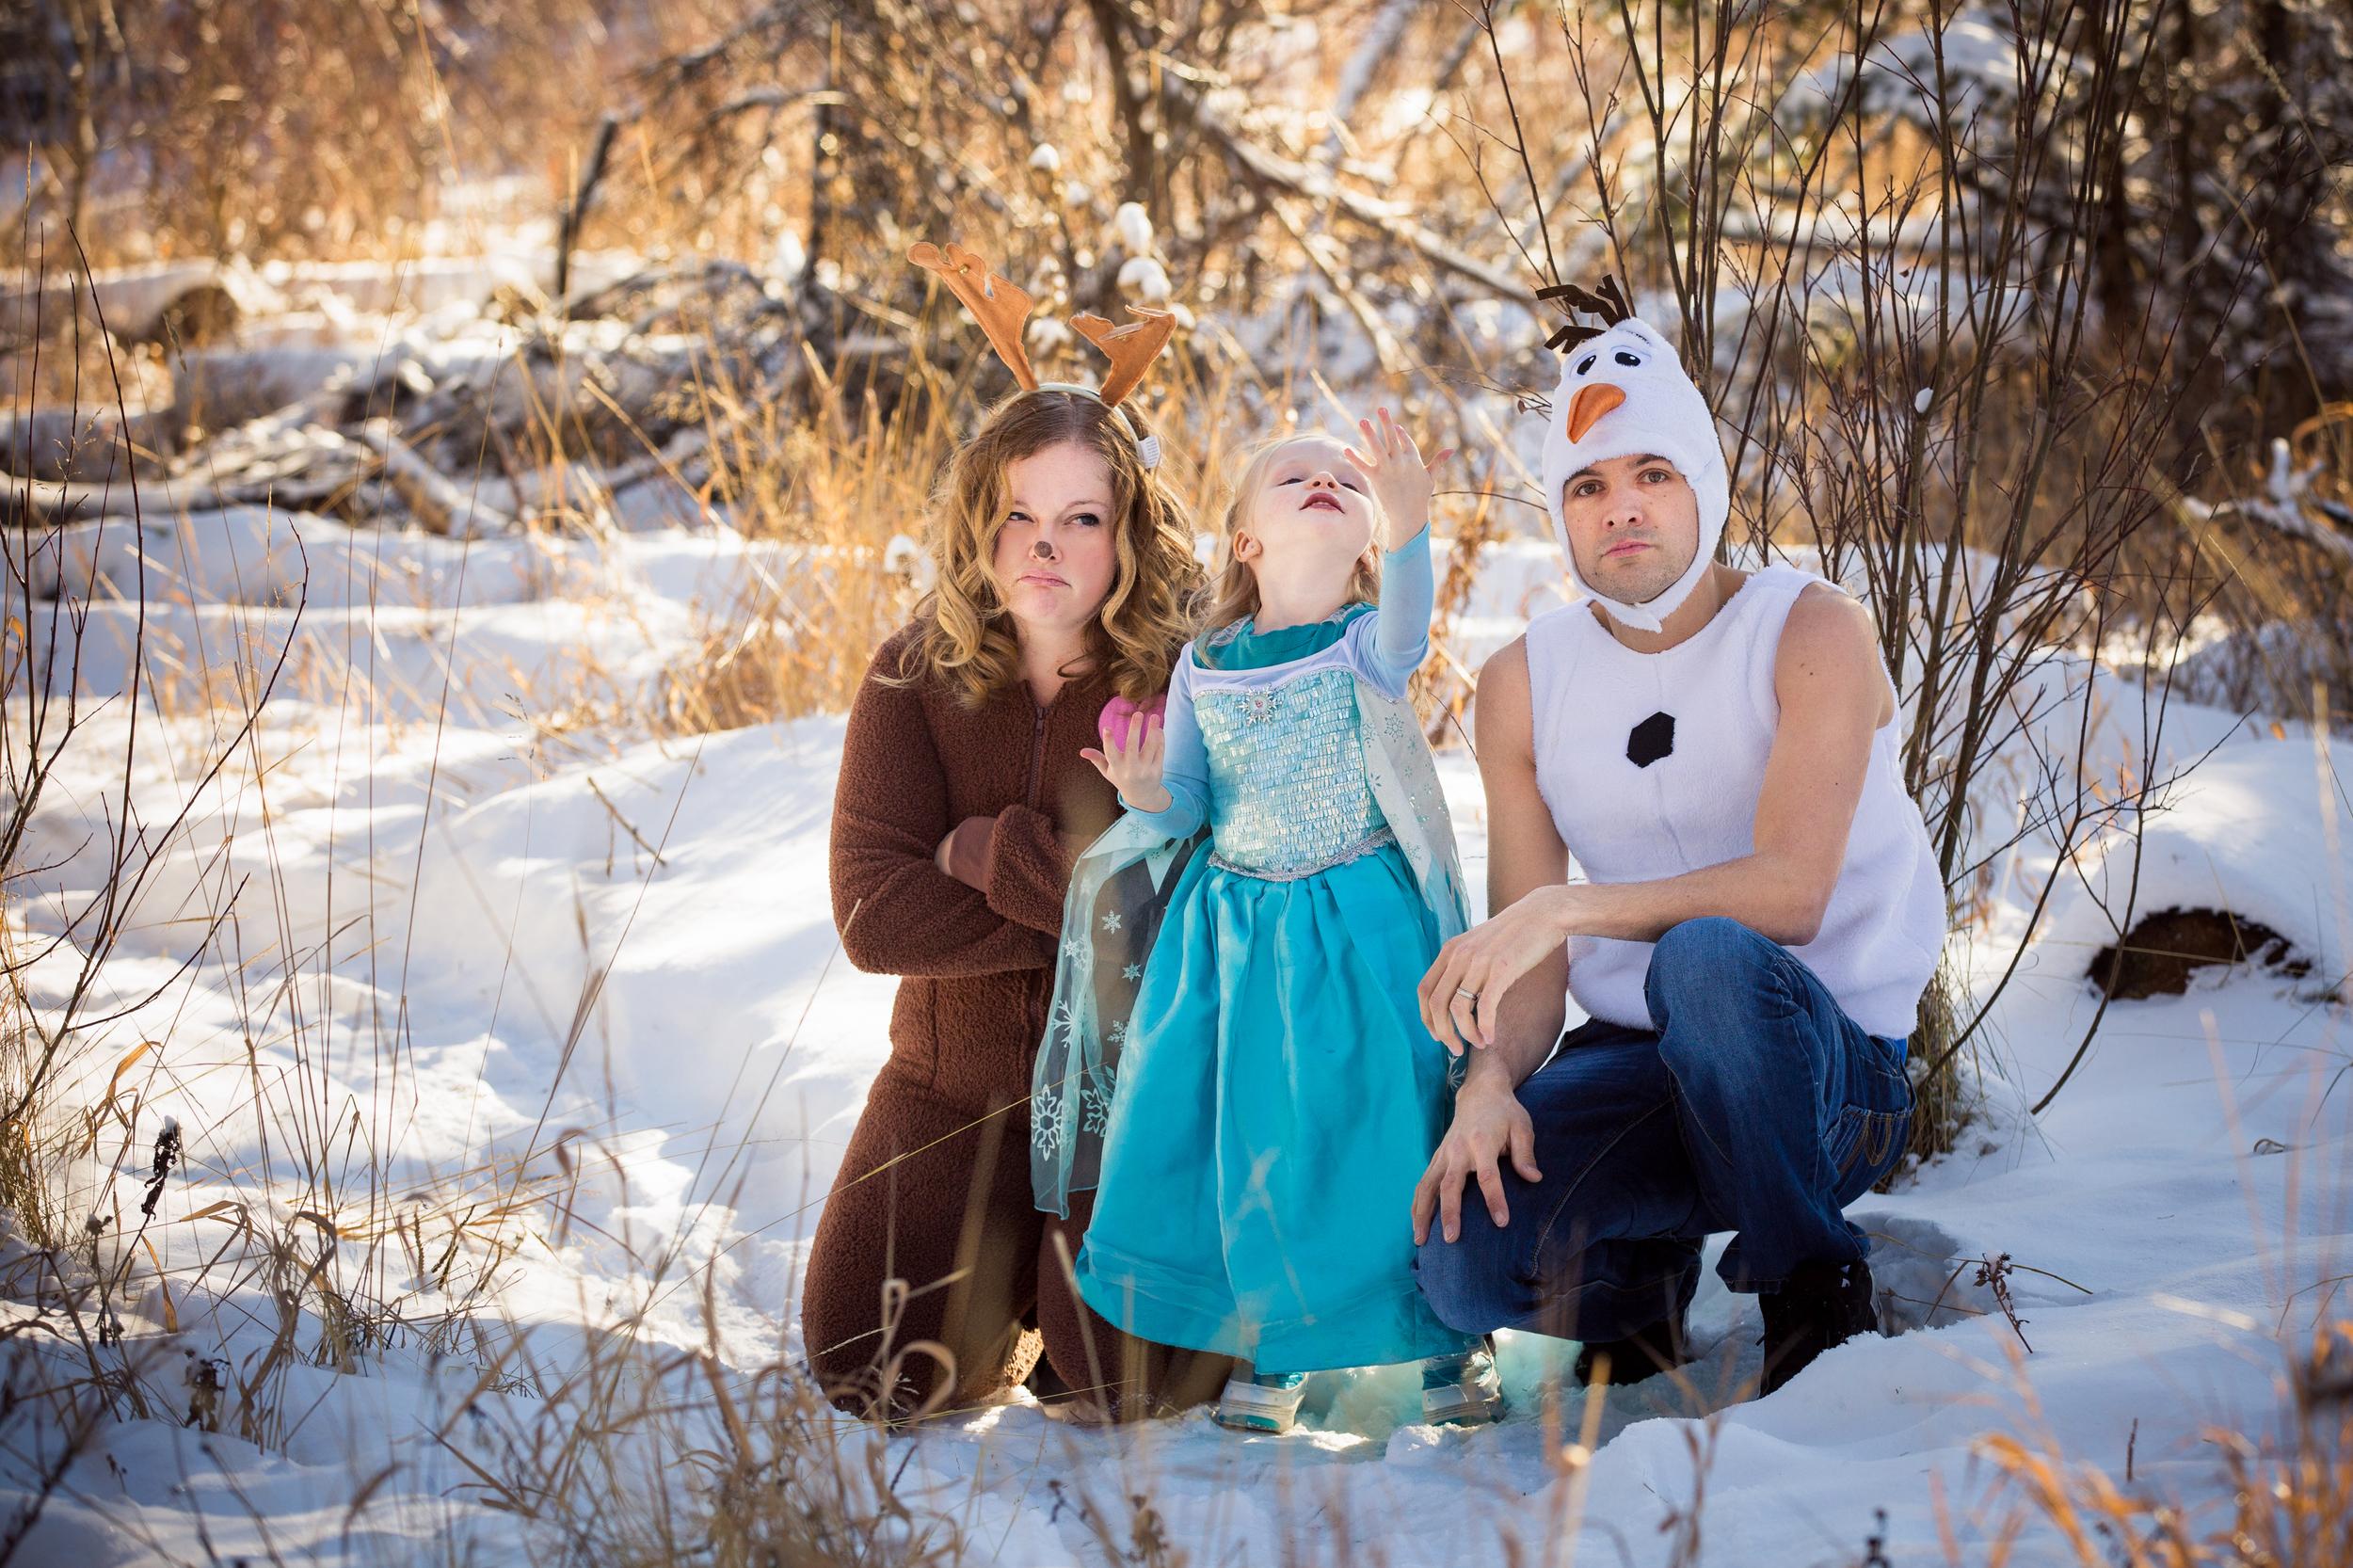 lightfootfamily-1-2.jpg